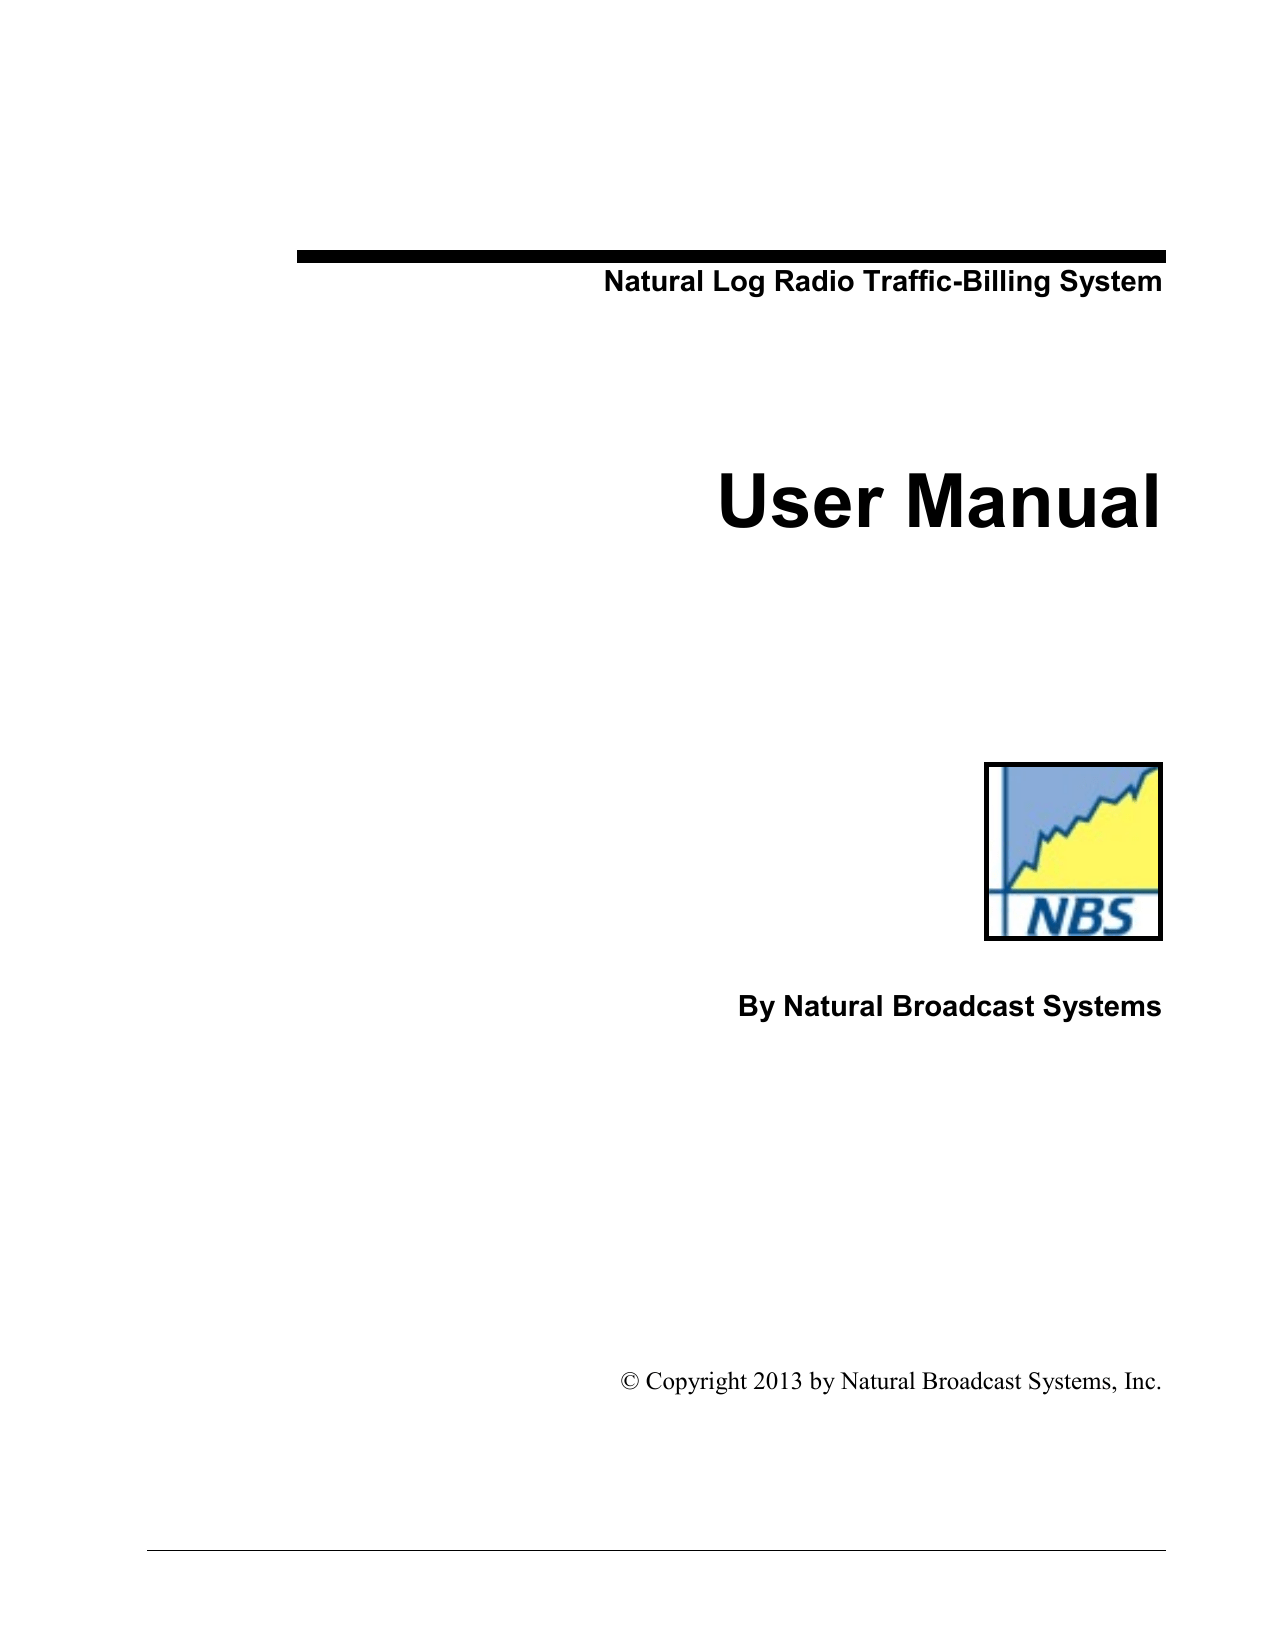 Natural Log Radio Traffic-Billing System User Manual